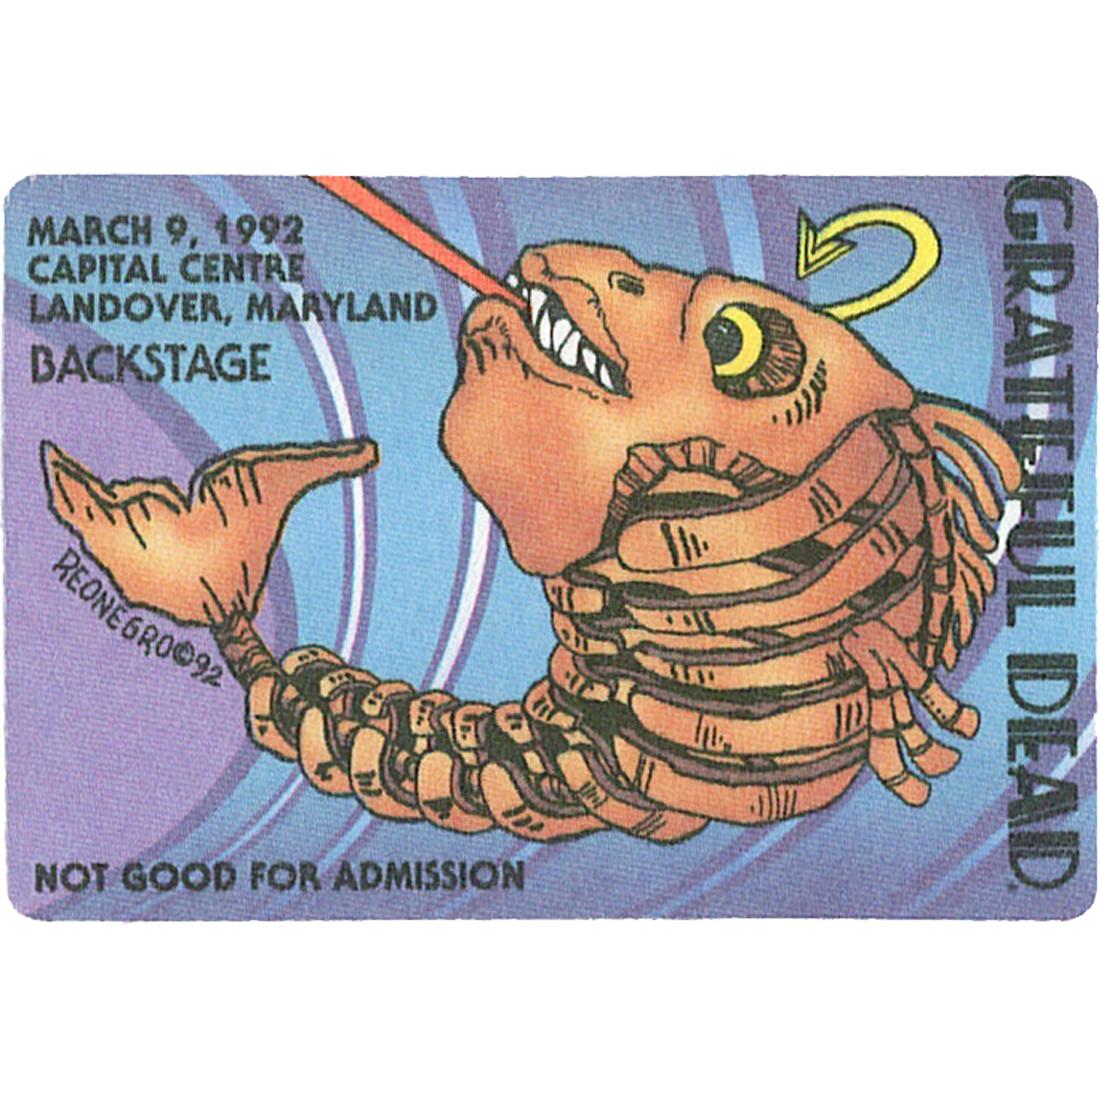 Grateful Dead 1992 03-09 Backstage Pass